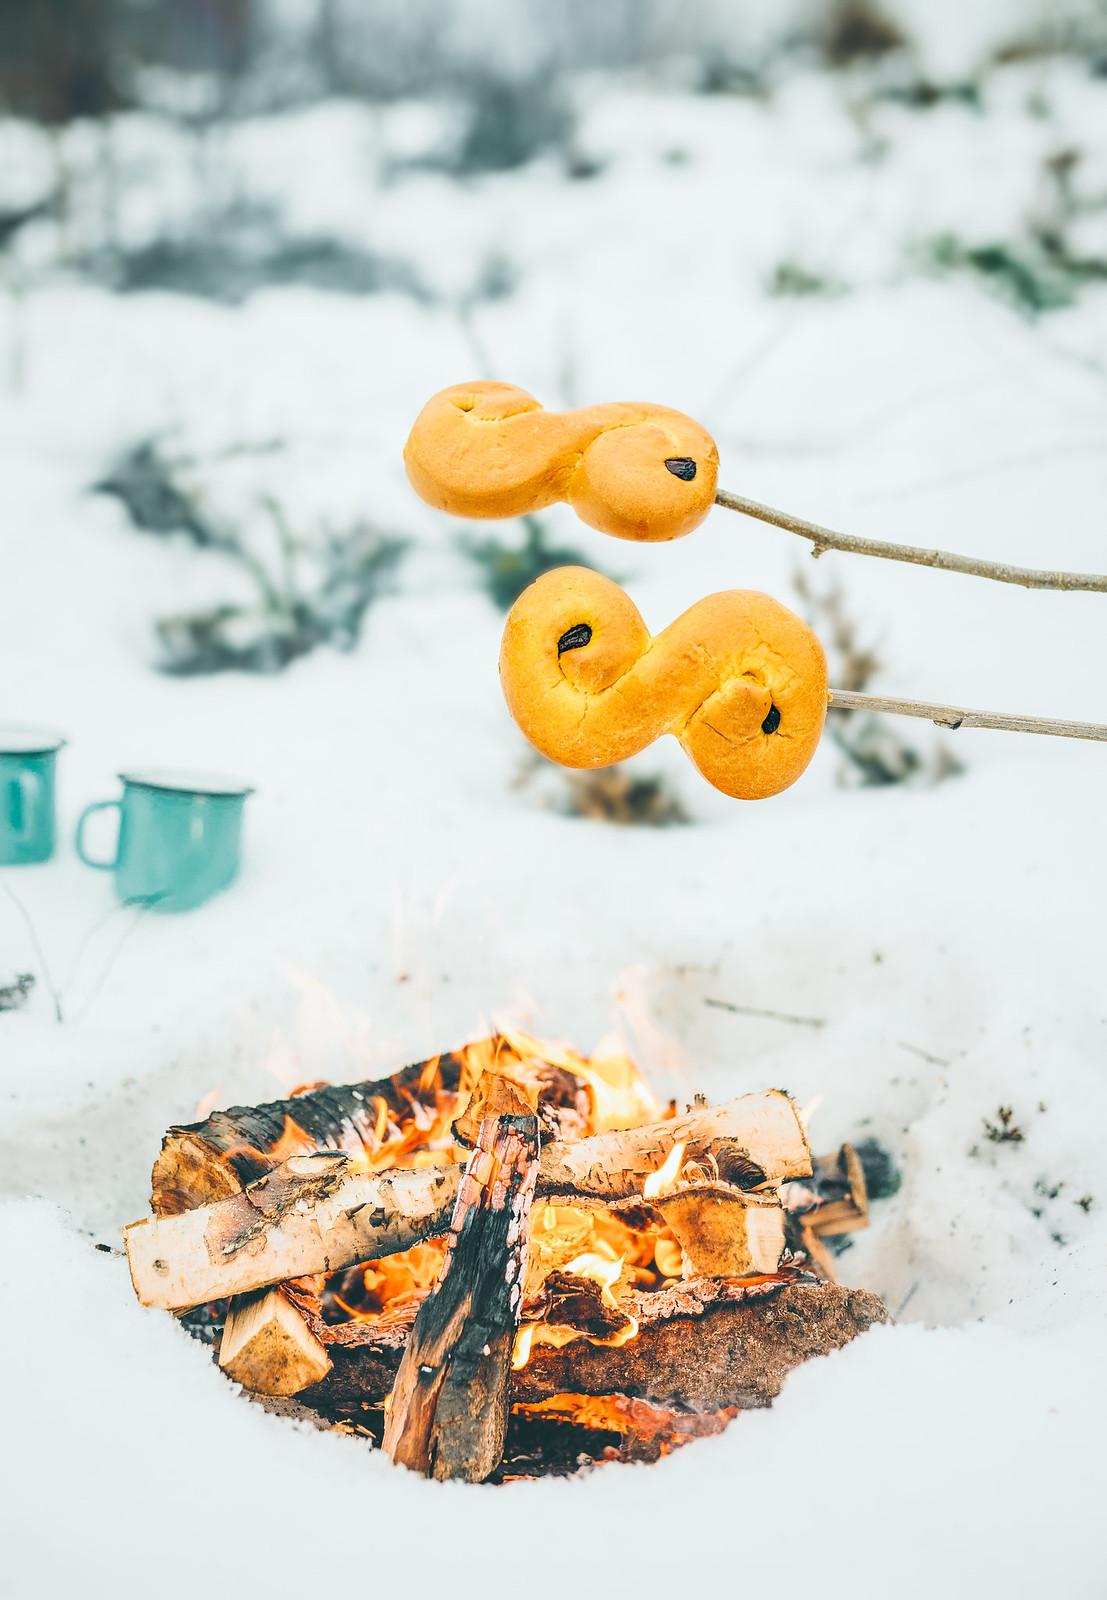 grilla lussekatter - karinevelina.se